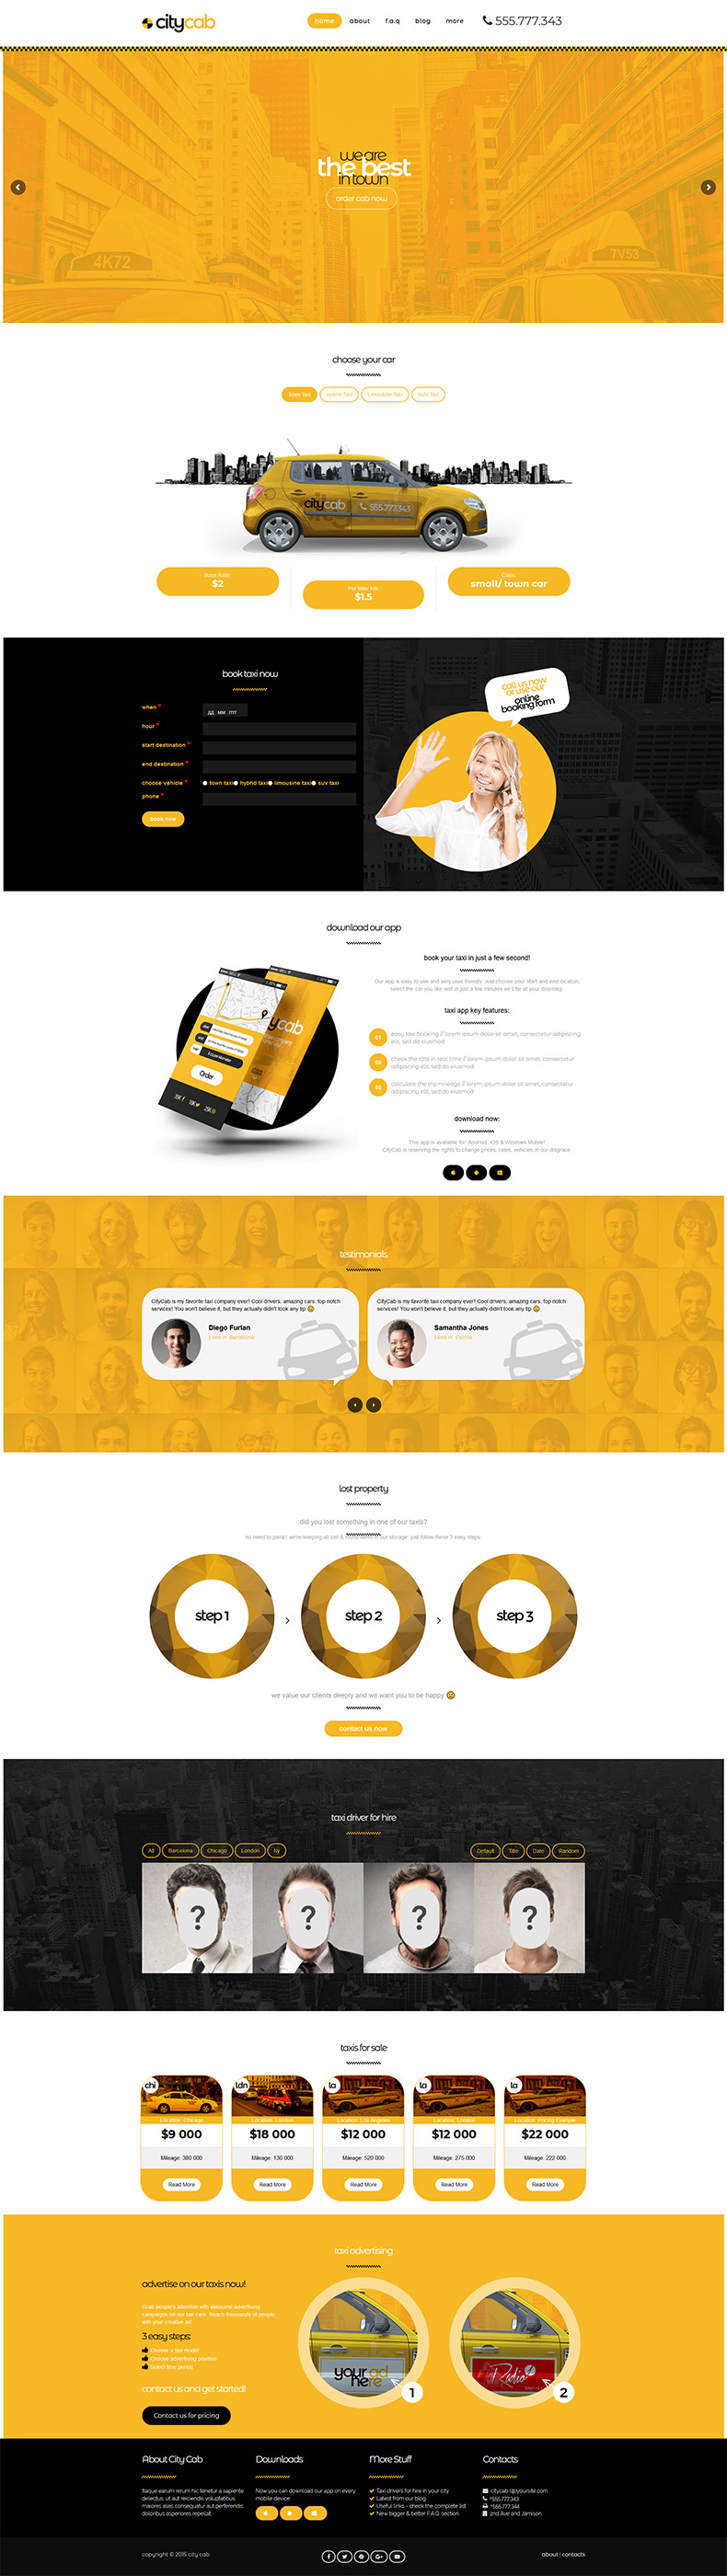 сайт такси киев